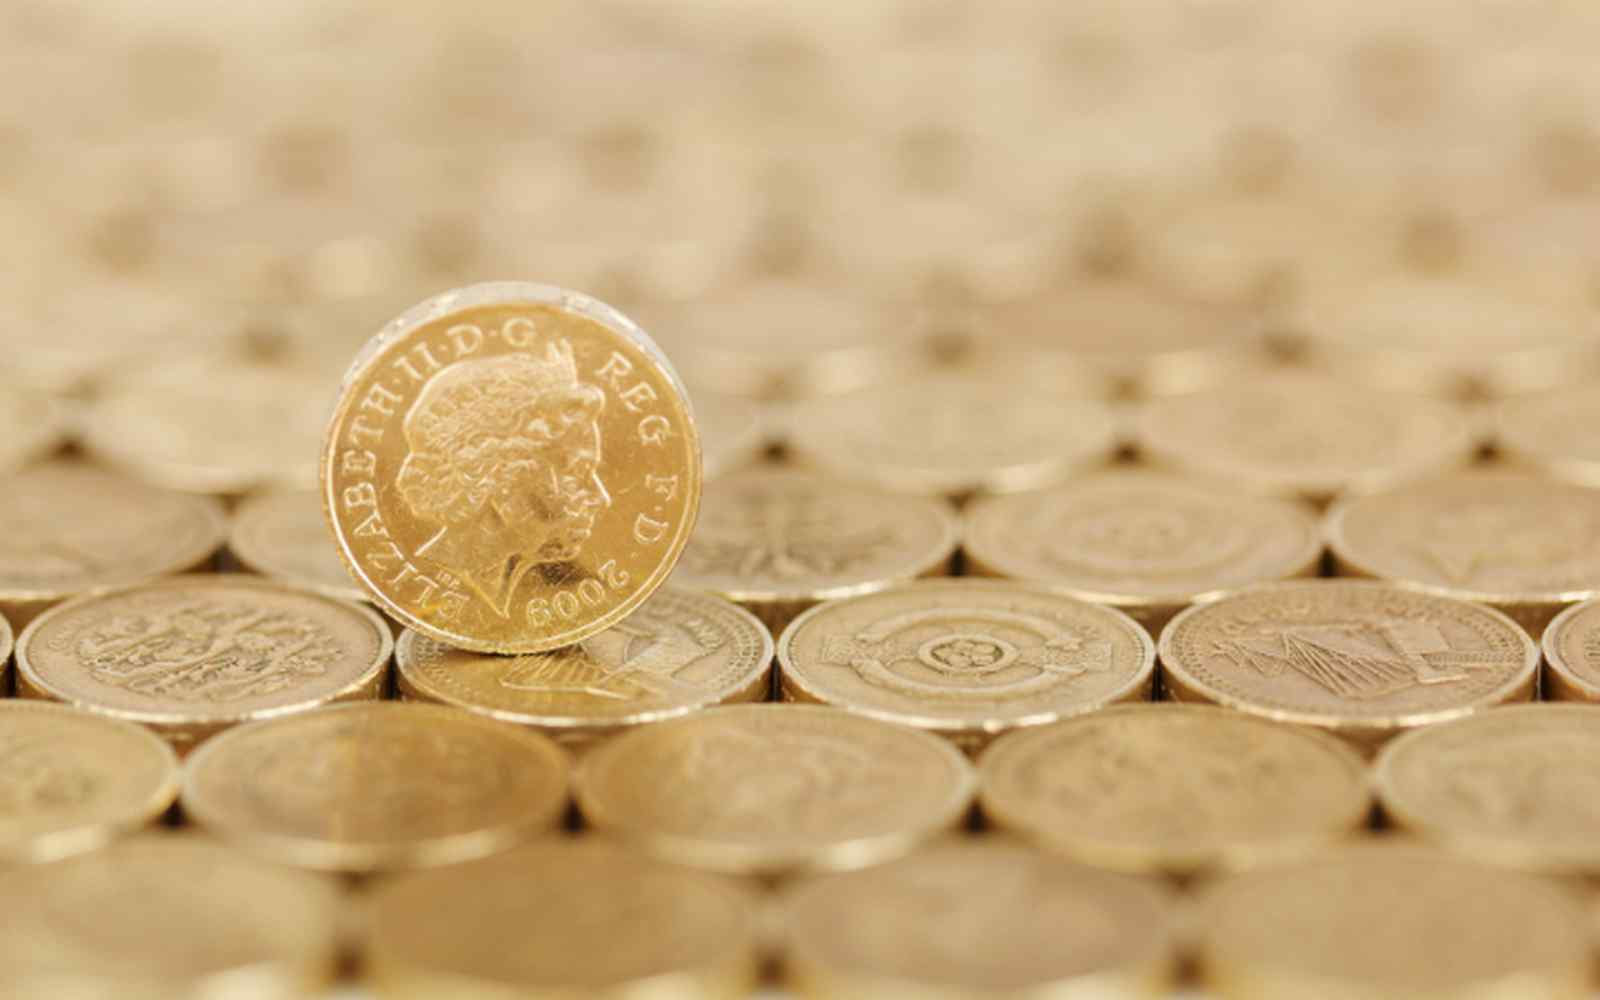 Uniform display of pound coins